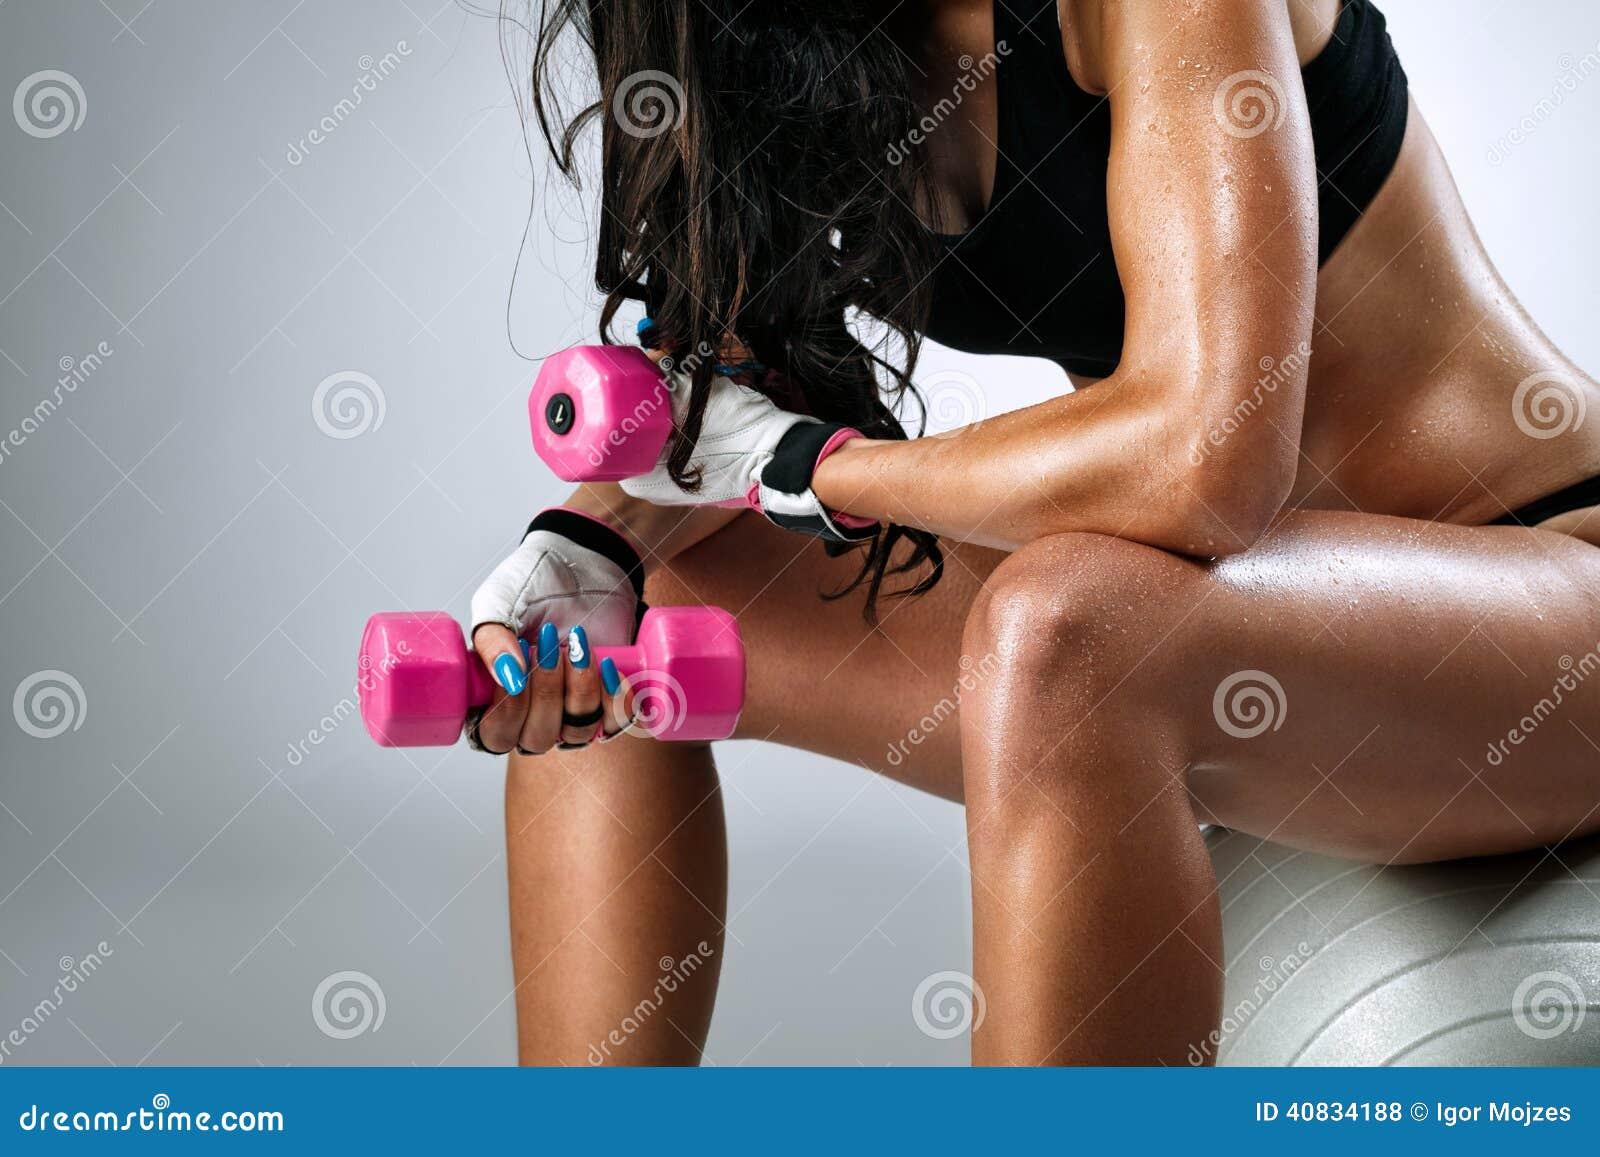 image Sweaty body after workout masturbation close up penis hairy latino don ston